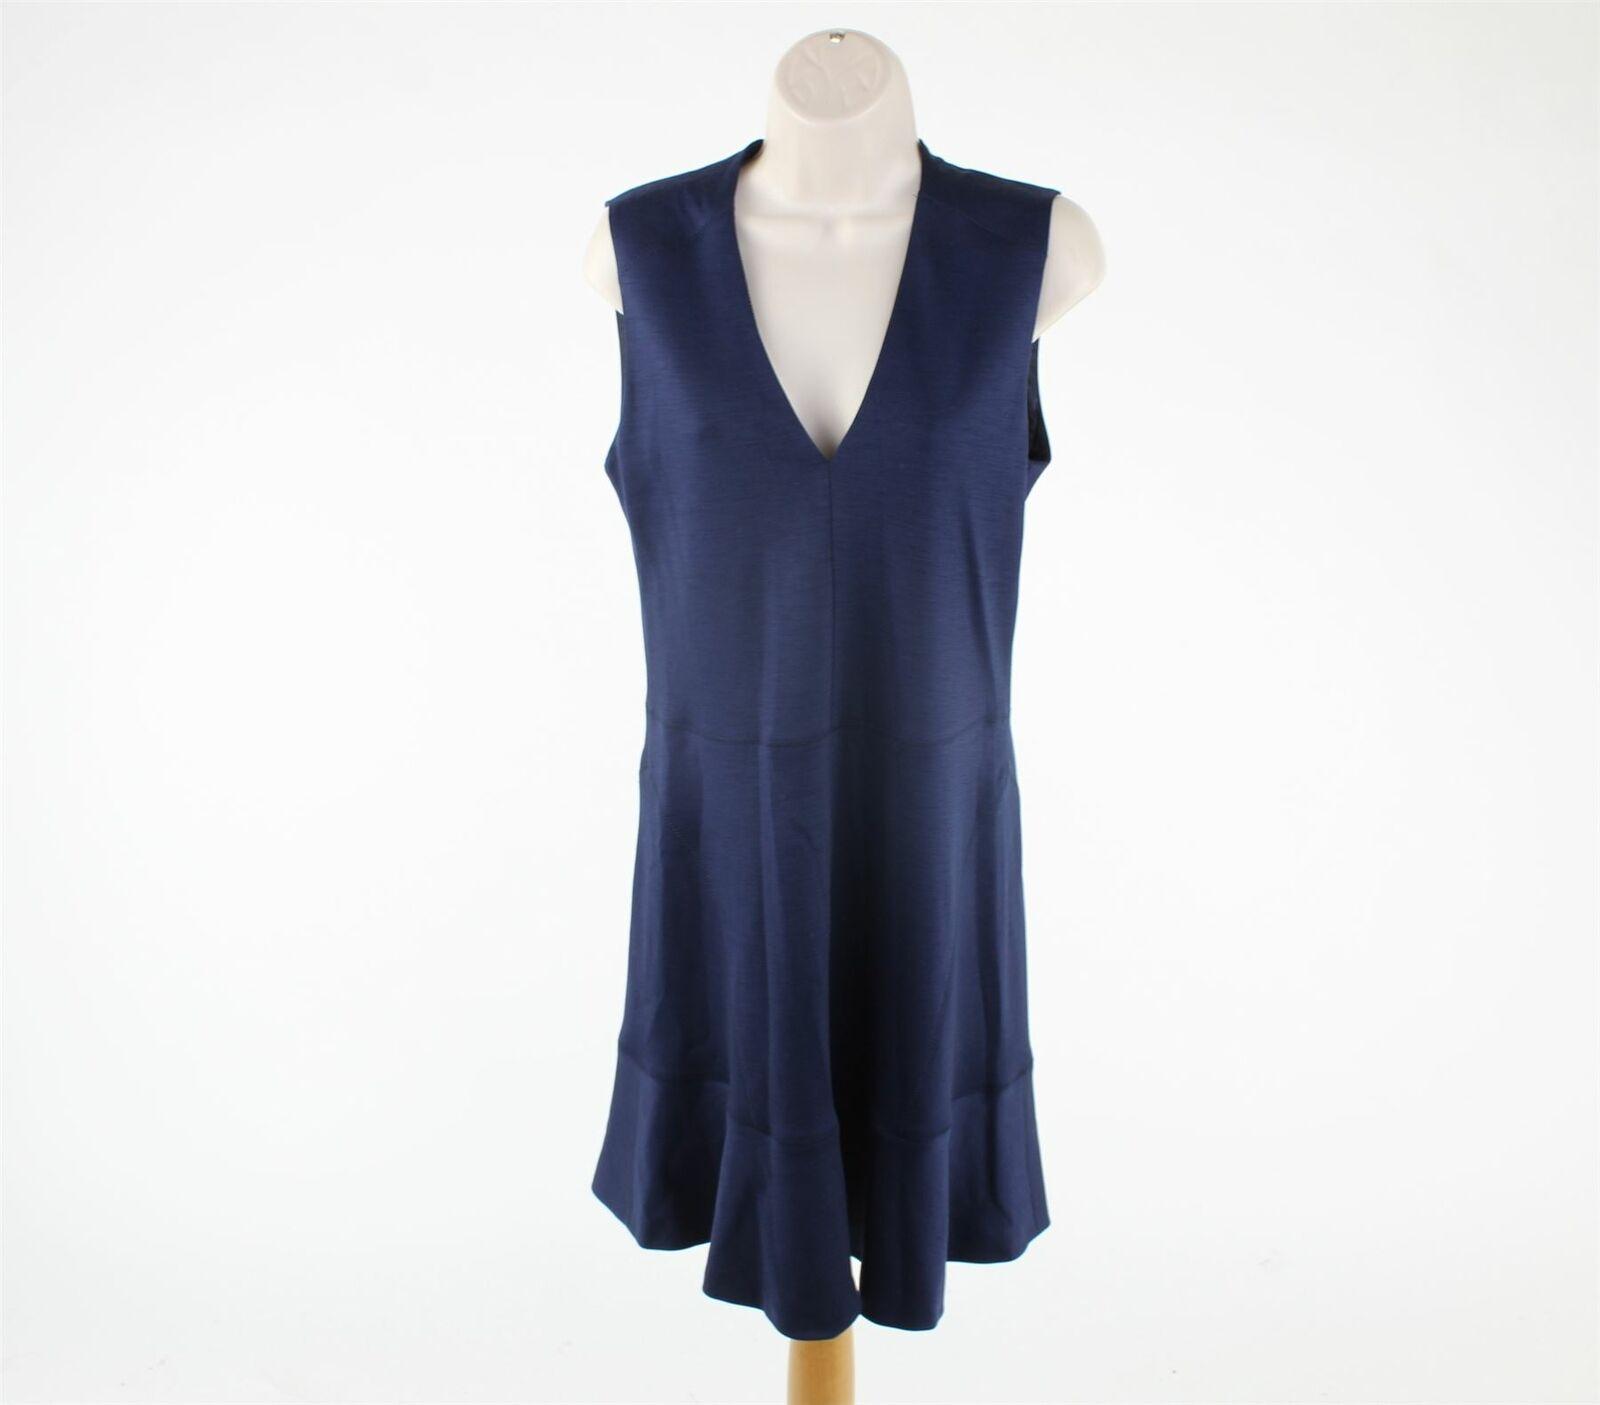 JOSEPH Navy Blau Wool Blend Dress, UK 12 US 8 EU 40